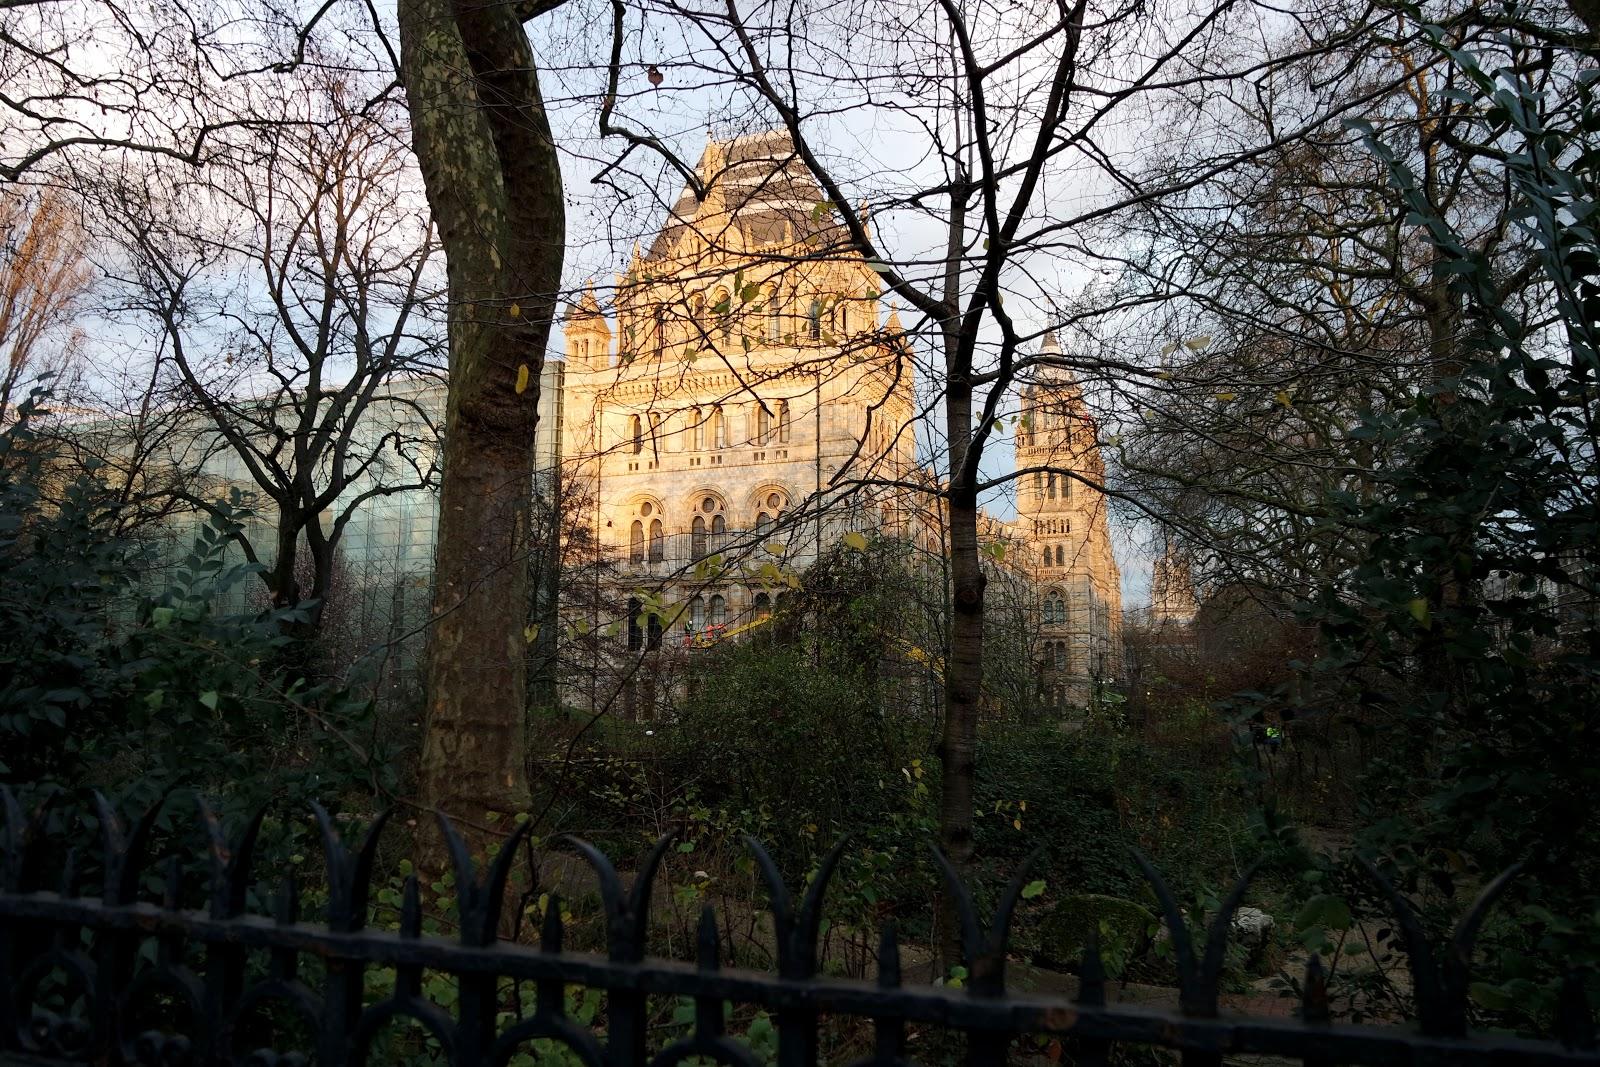 natural history museum, South Kensington, London, Londres, vlog, blog, travel, travelling, london streets, french,